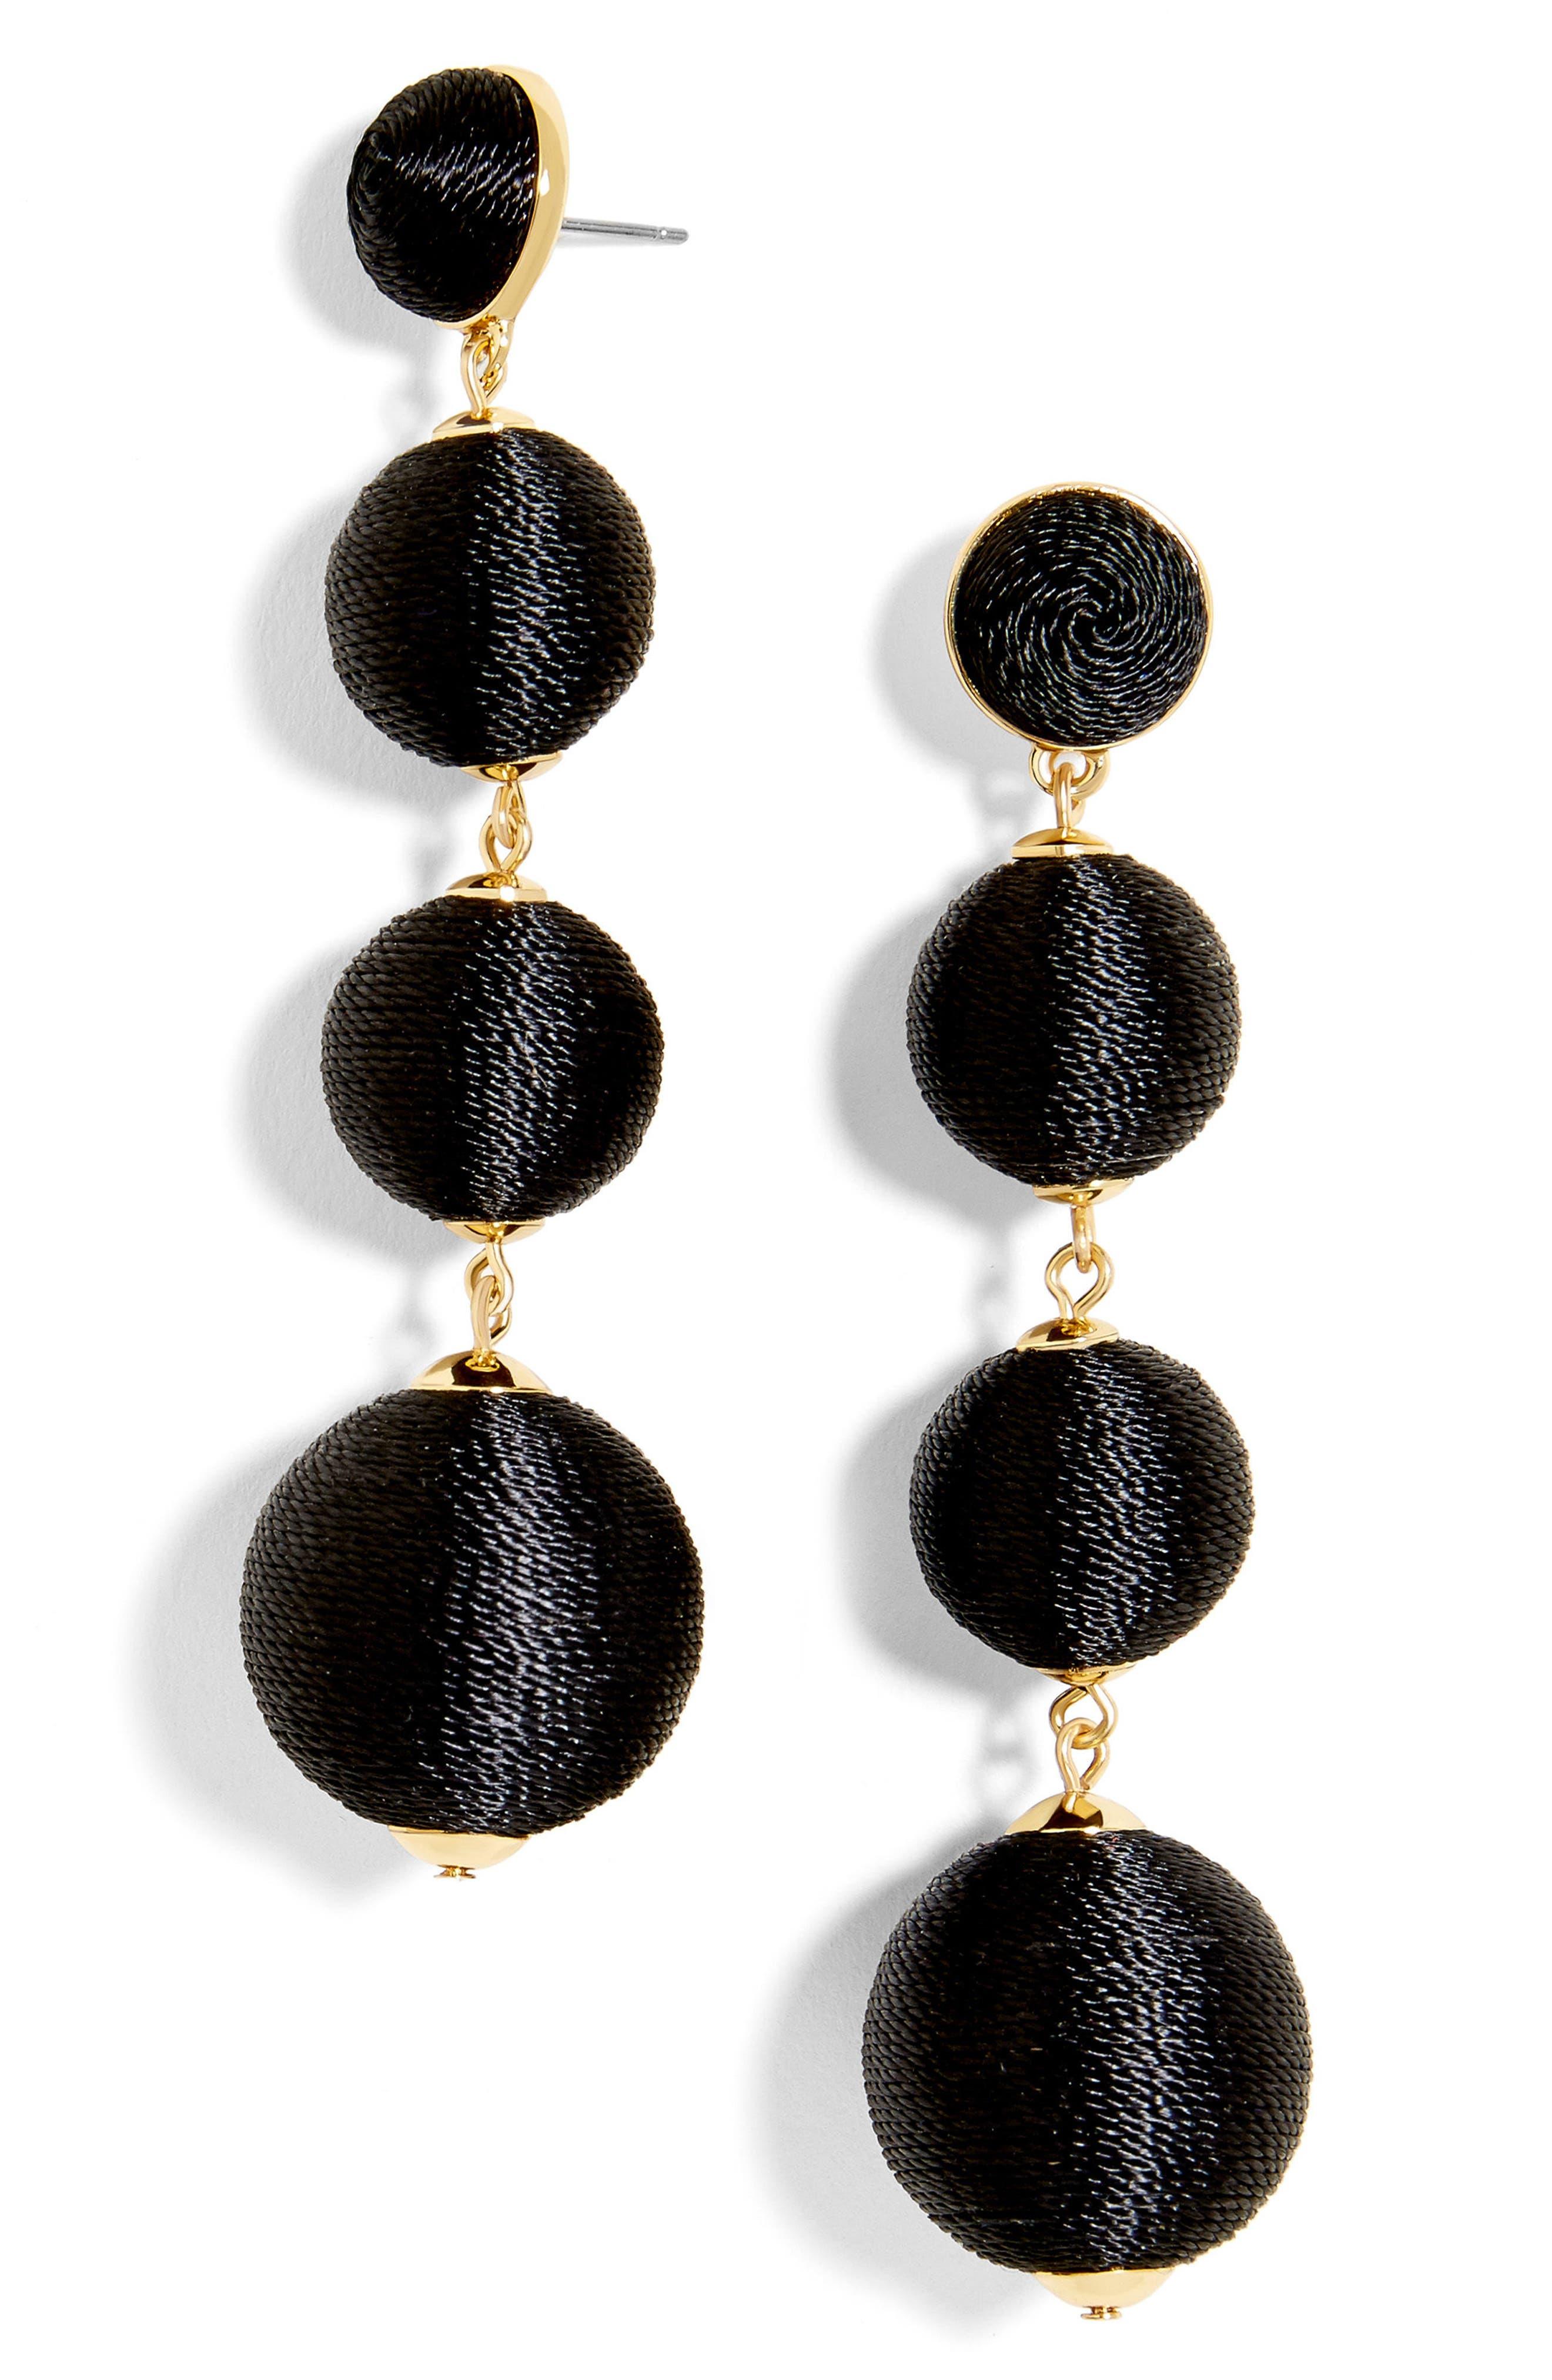 Main Image - BaubleBar Criselda Ball Shoulder Duster Earrings